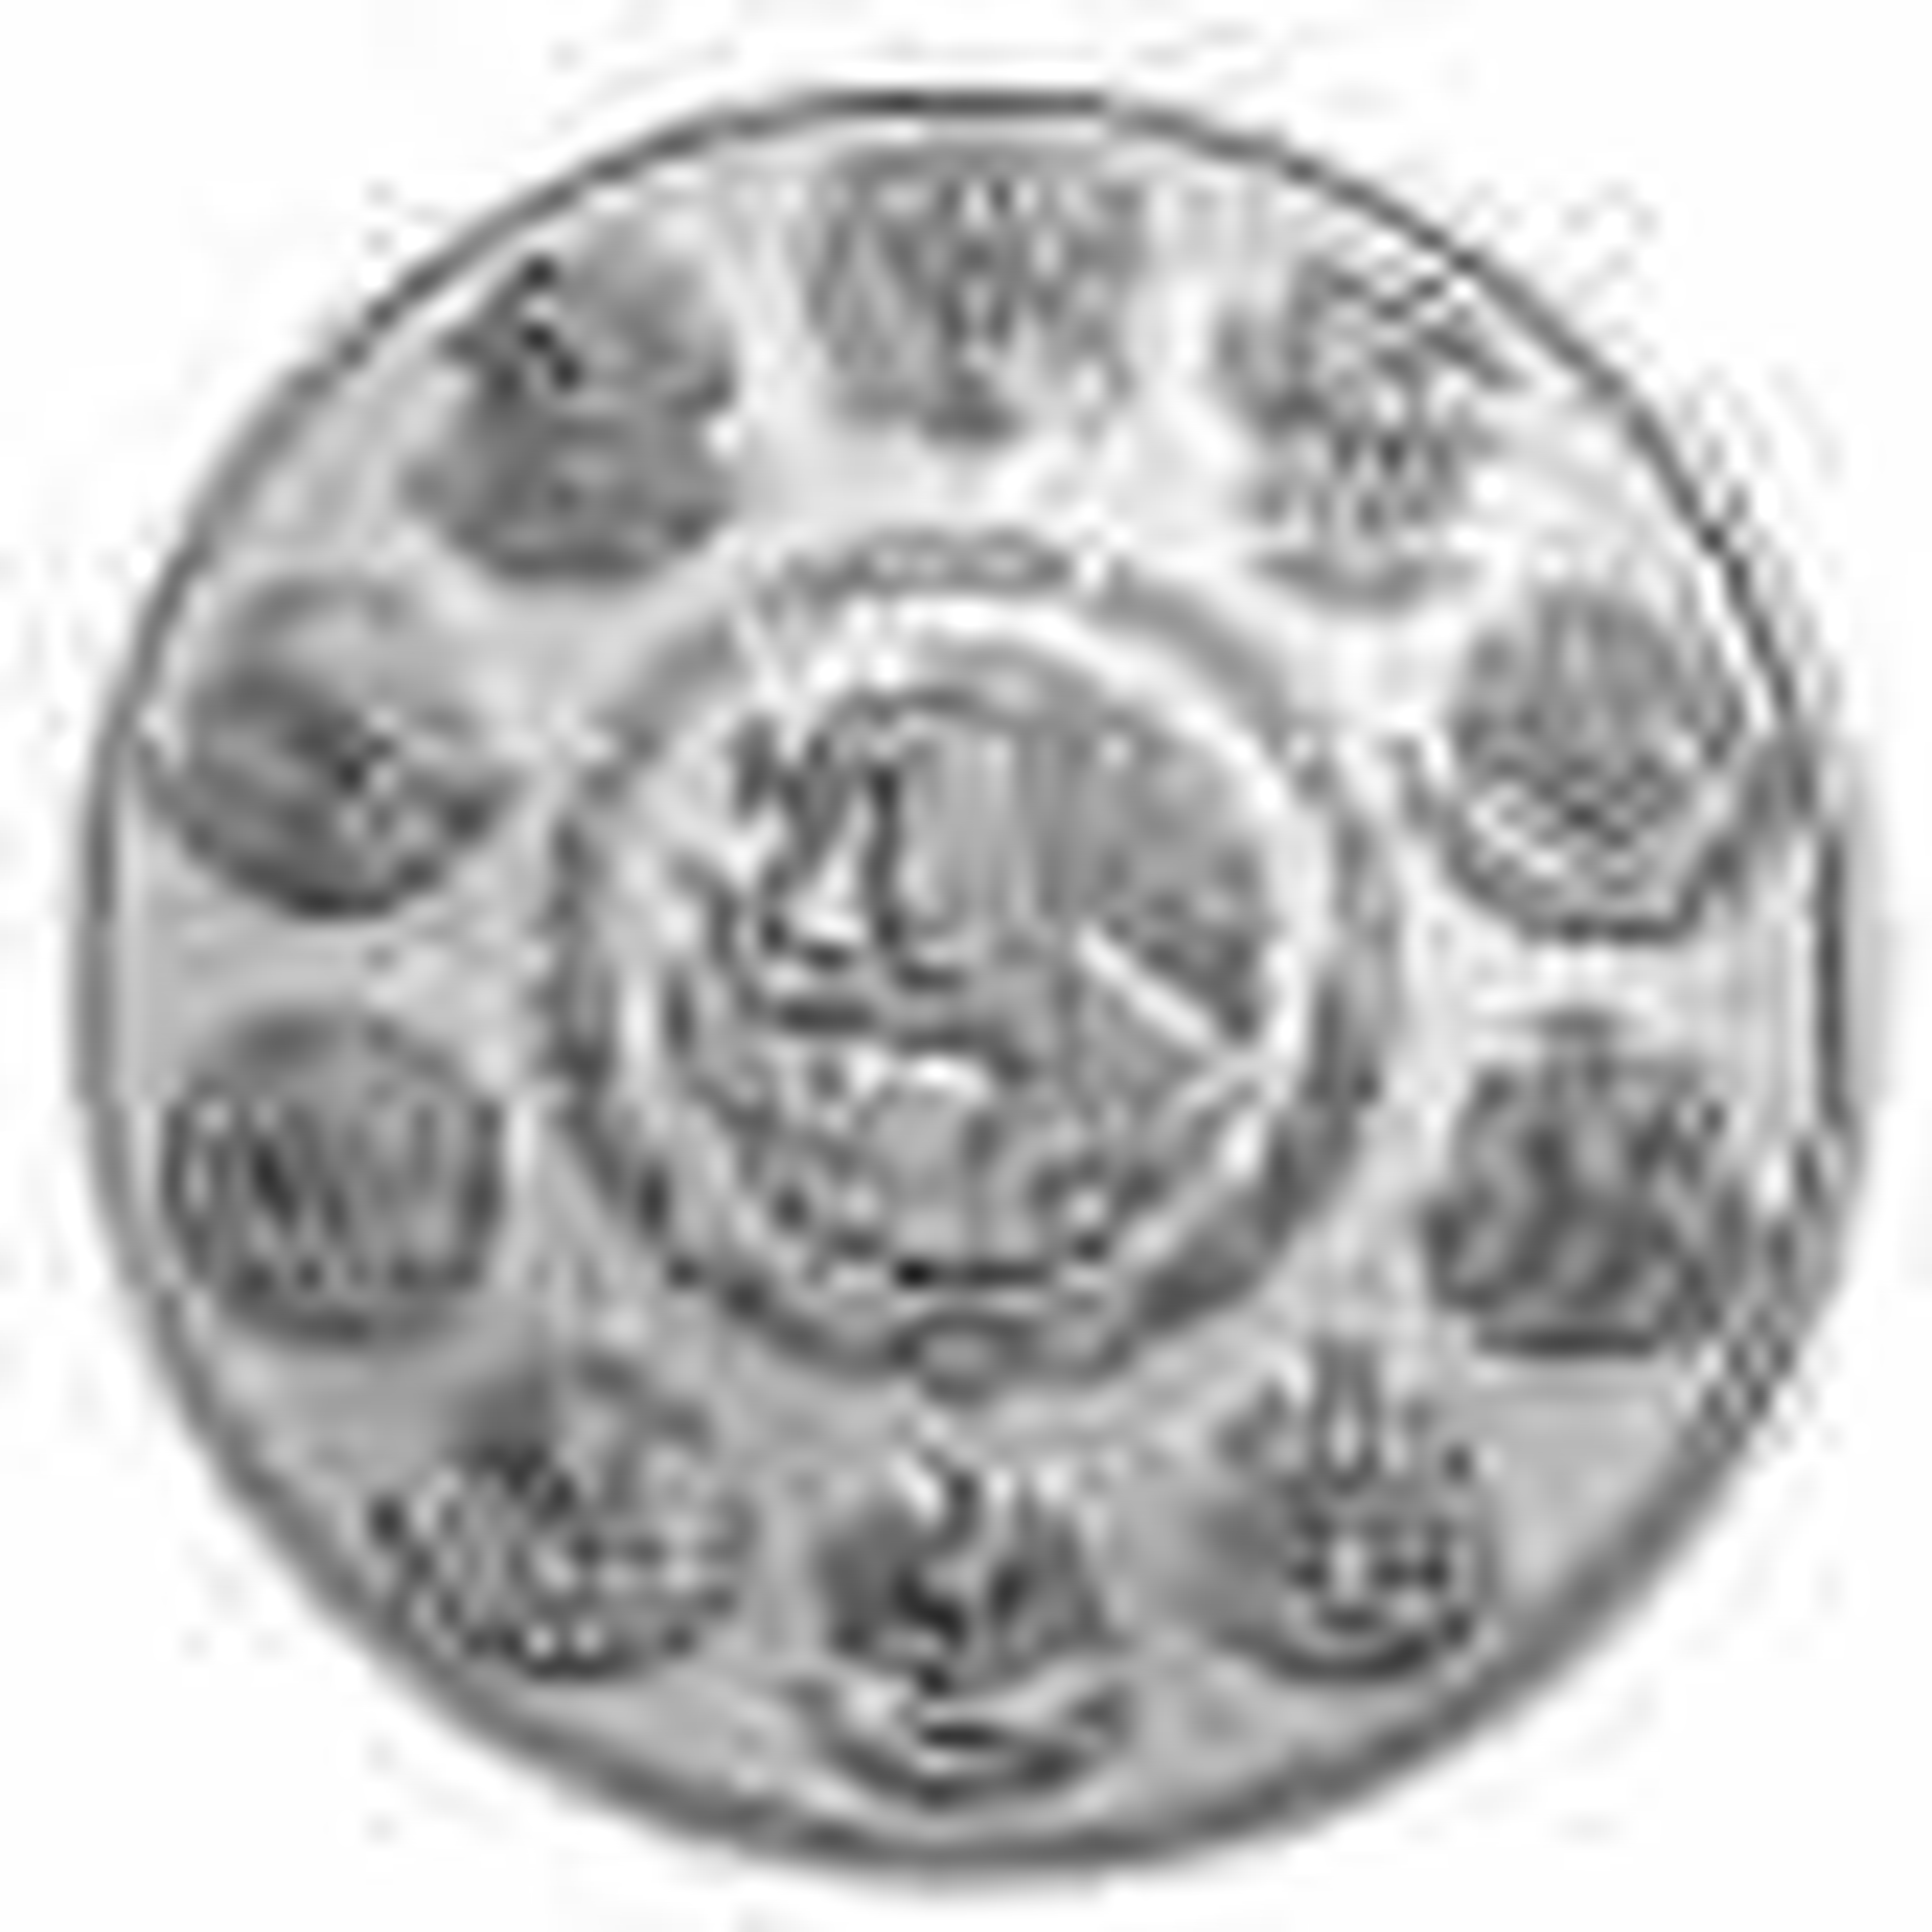 1 Troy ounce zilveren munt Mexican Libertad Circulated